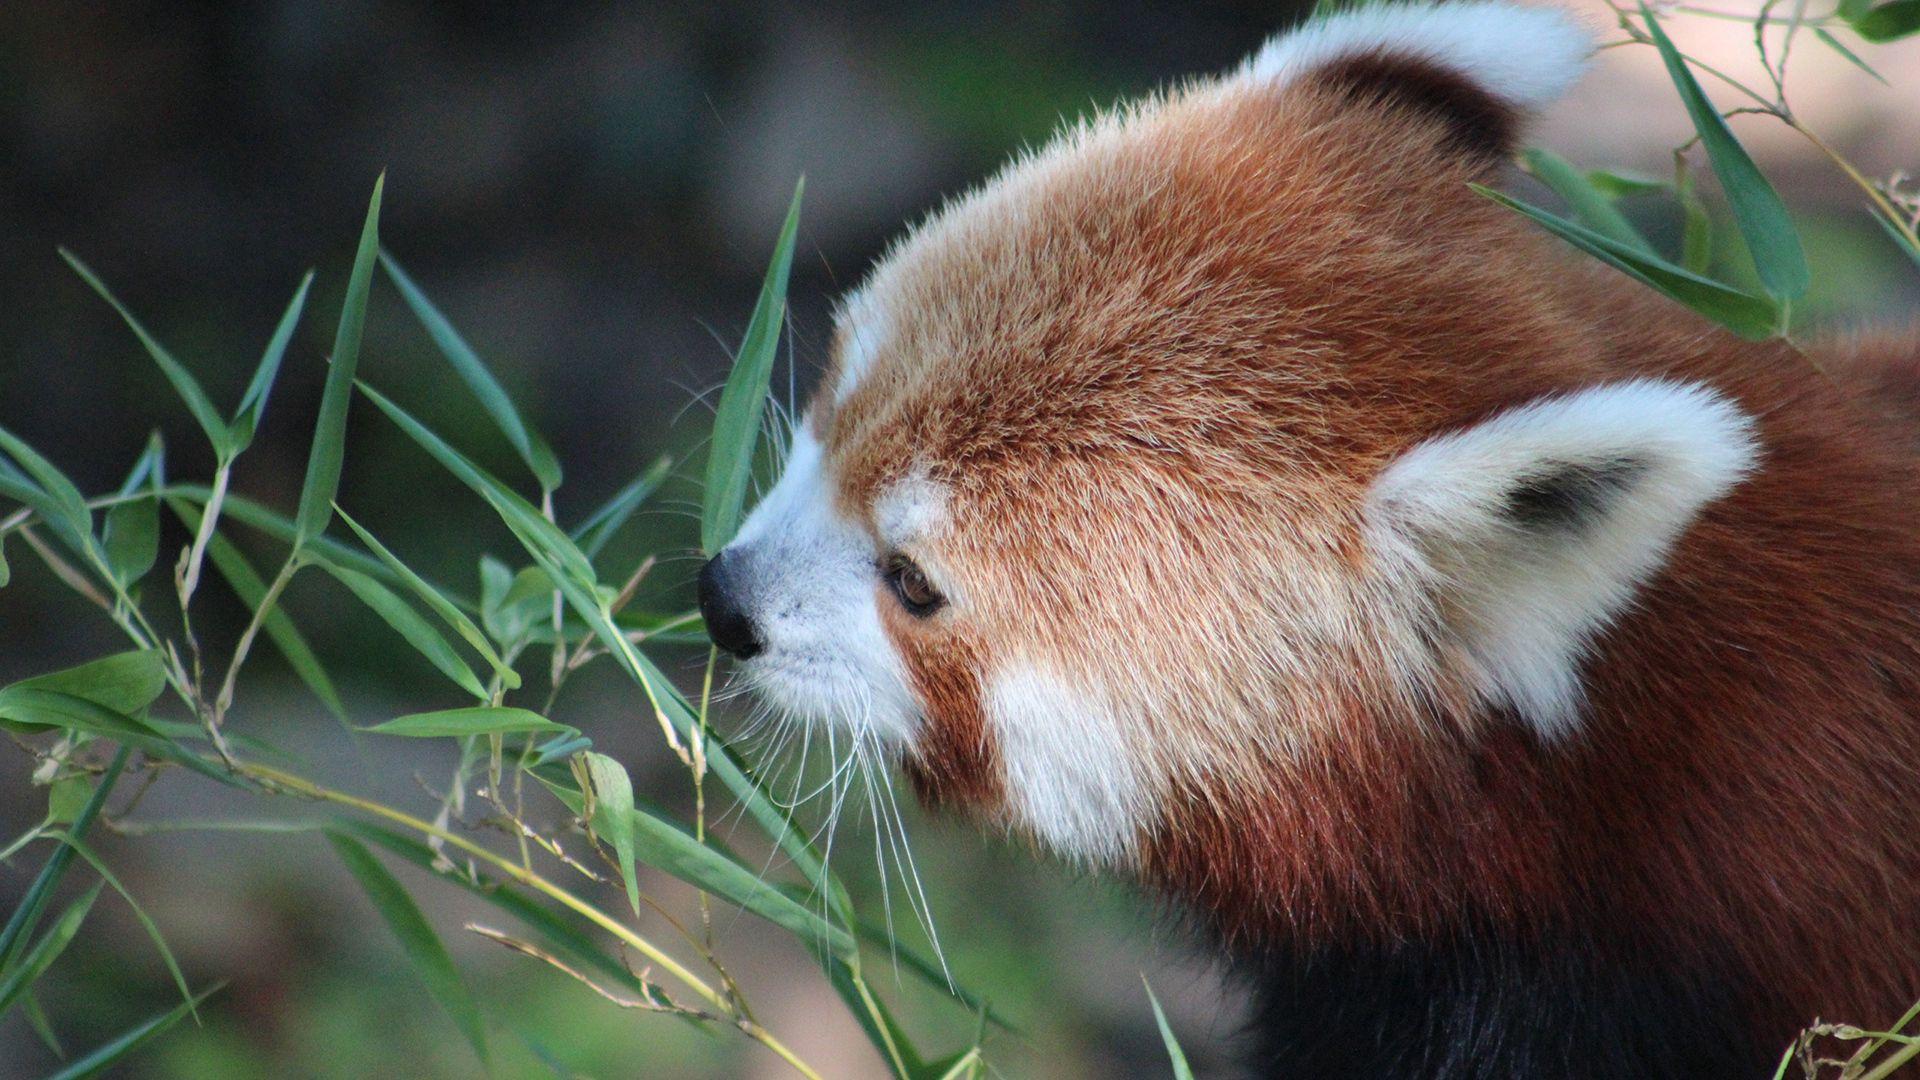 108520 download wallpaper Animals, Red Panda, Grass, Muzzle, Panda, Little Panda, Small Panda screensavers and pictures for free